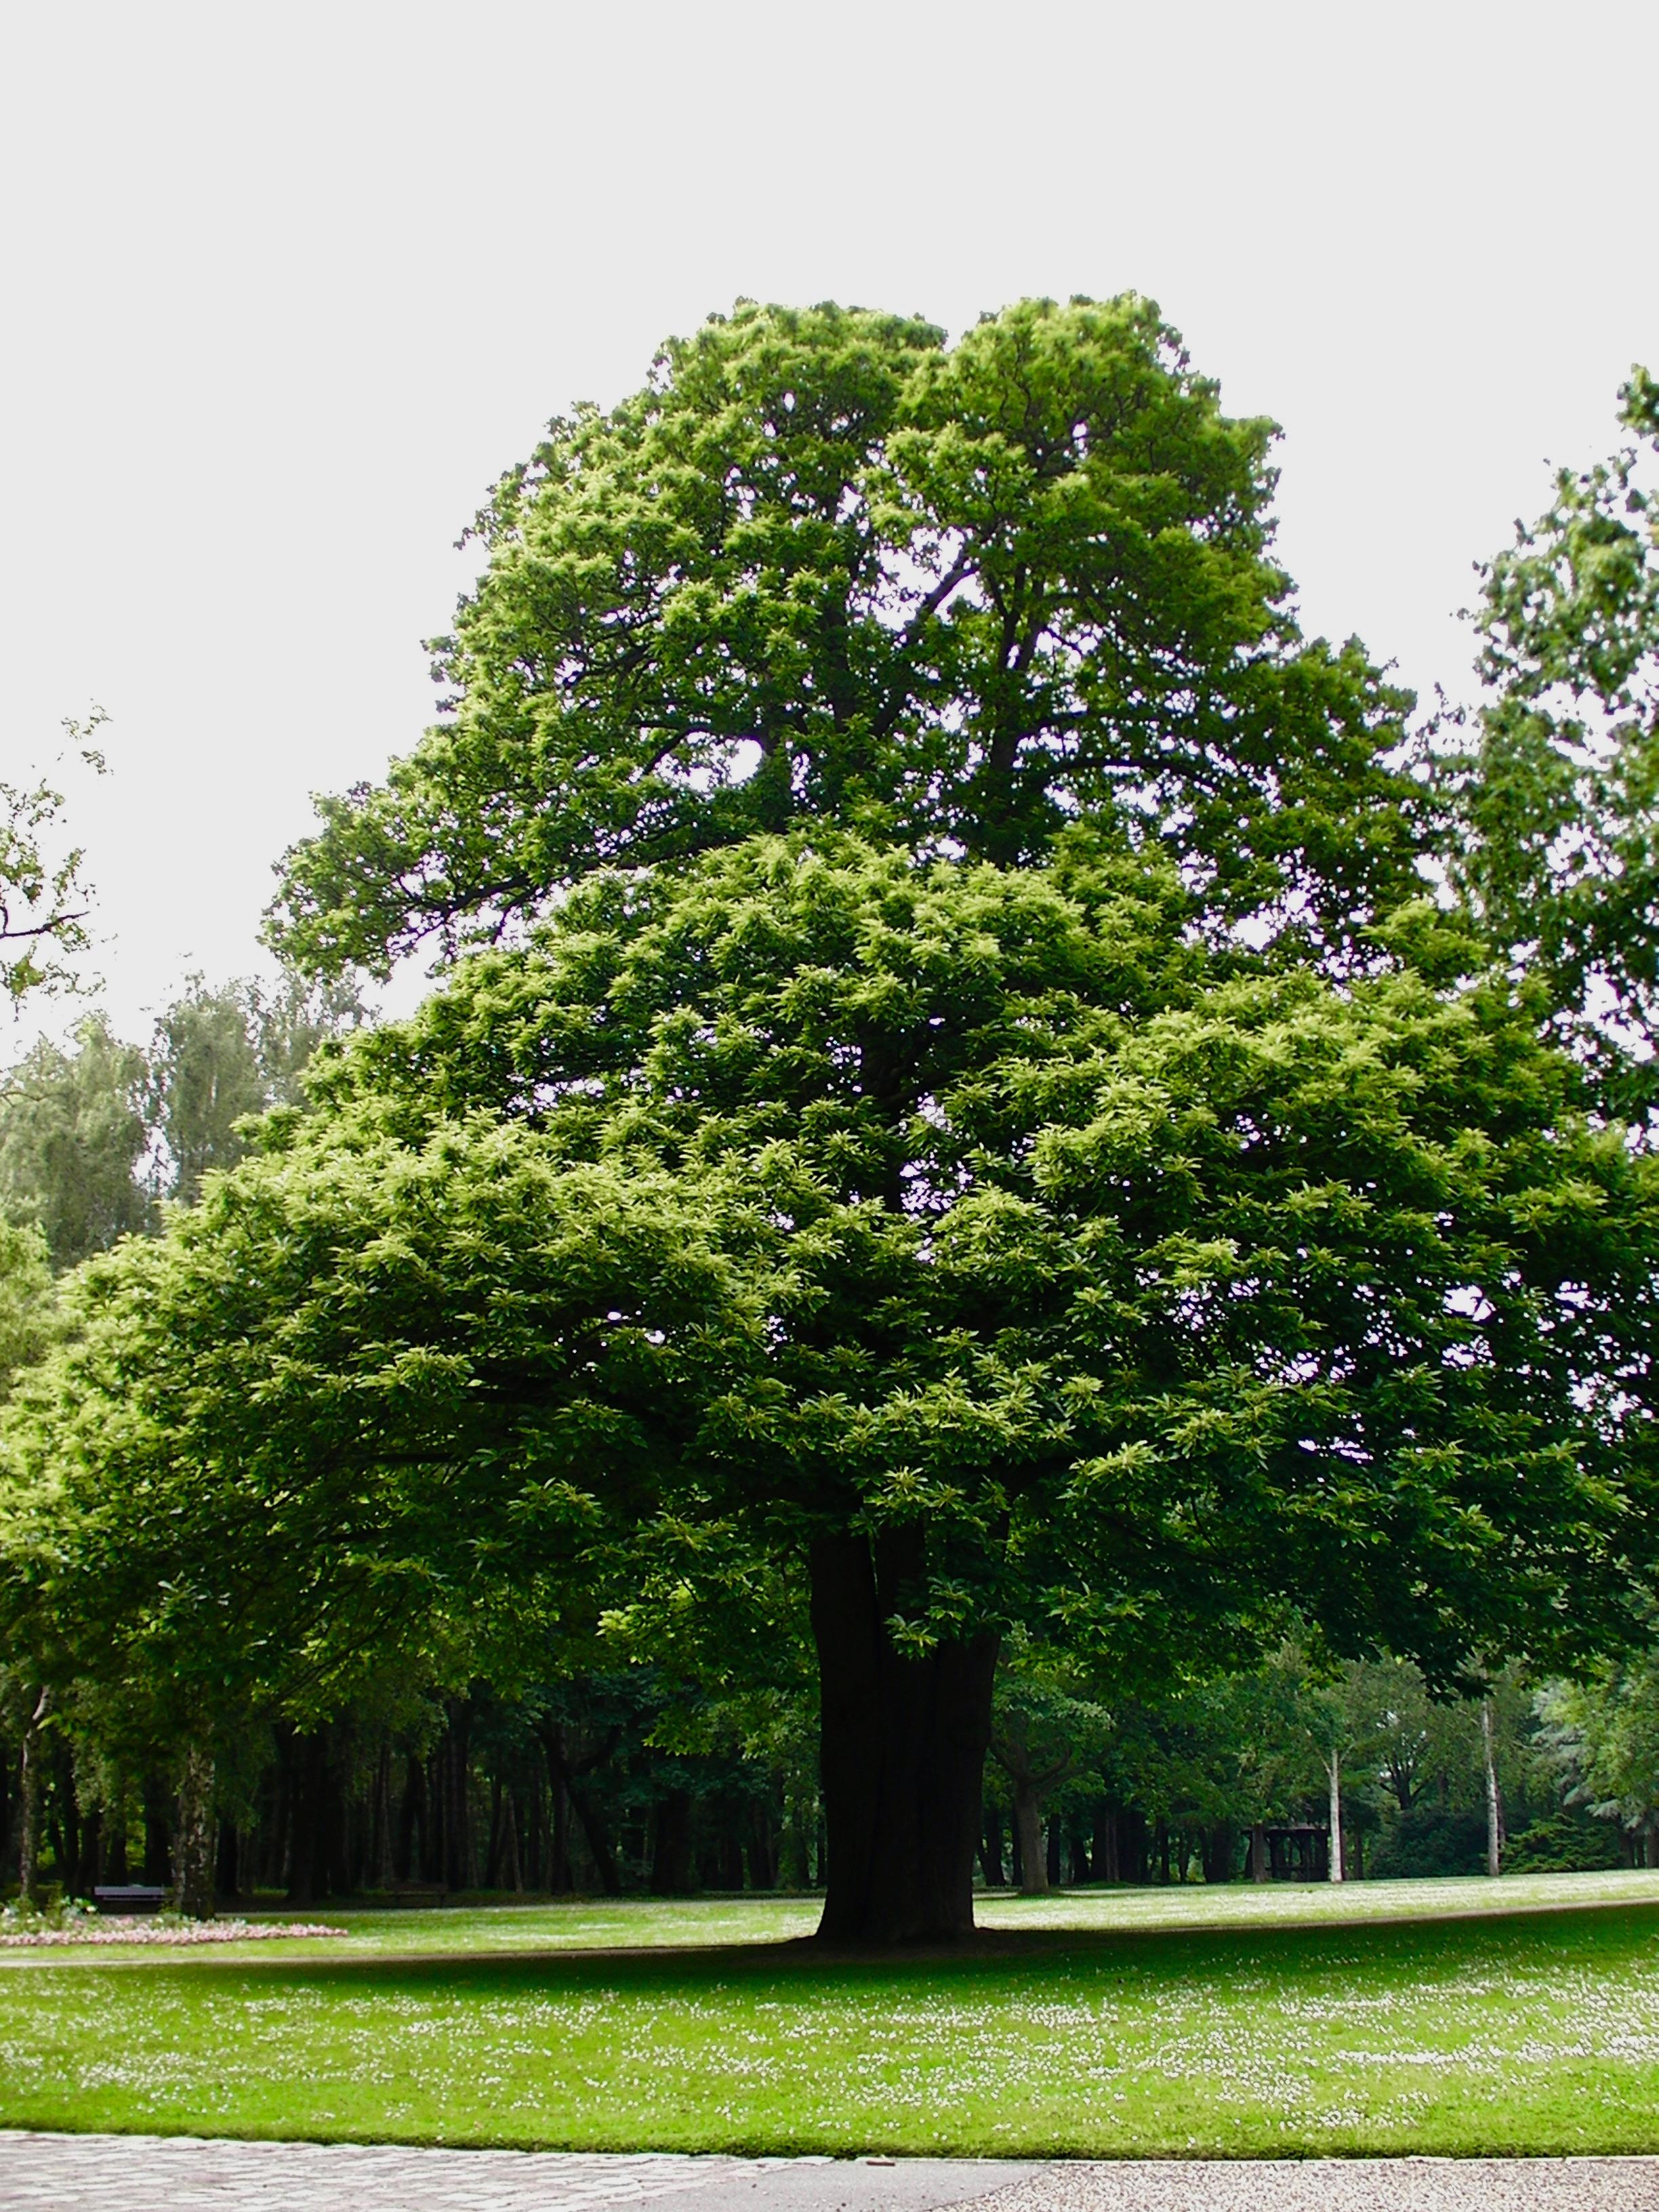 Le pied racine de l'arbre